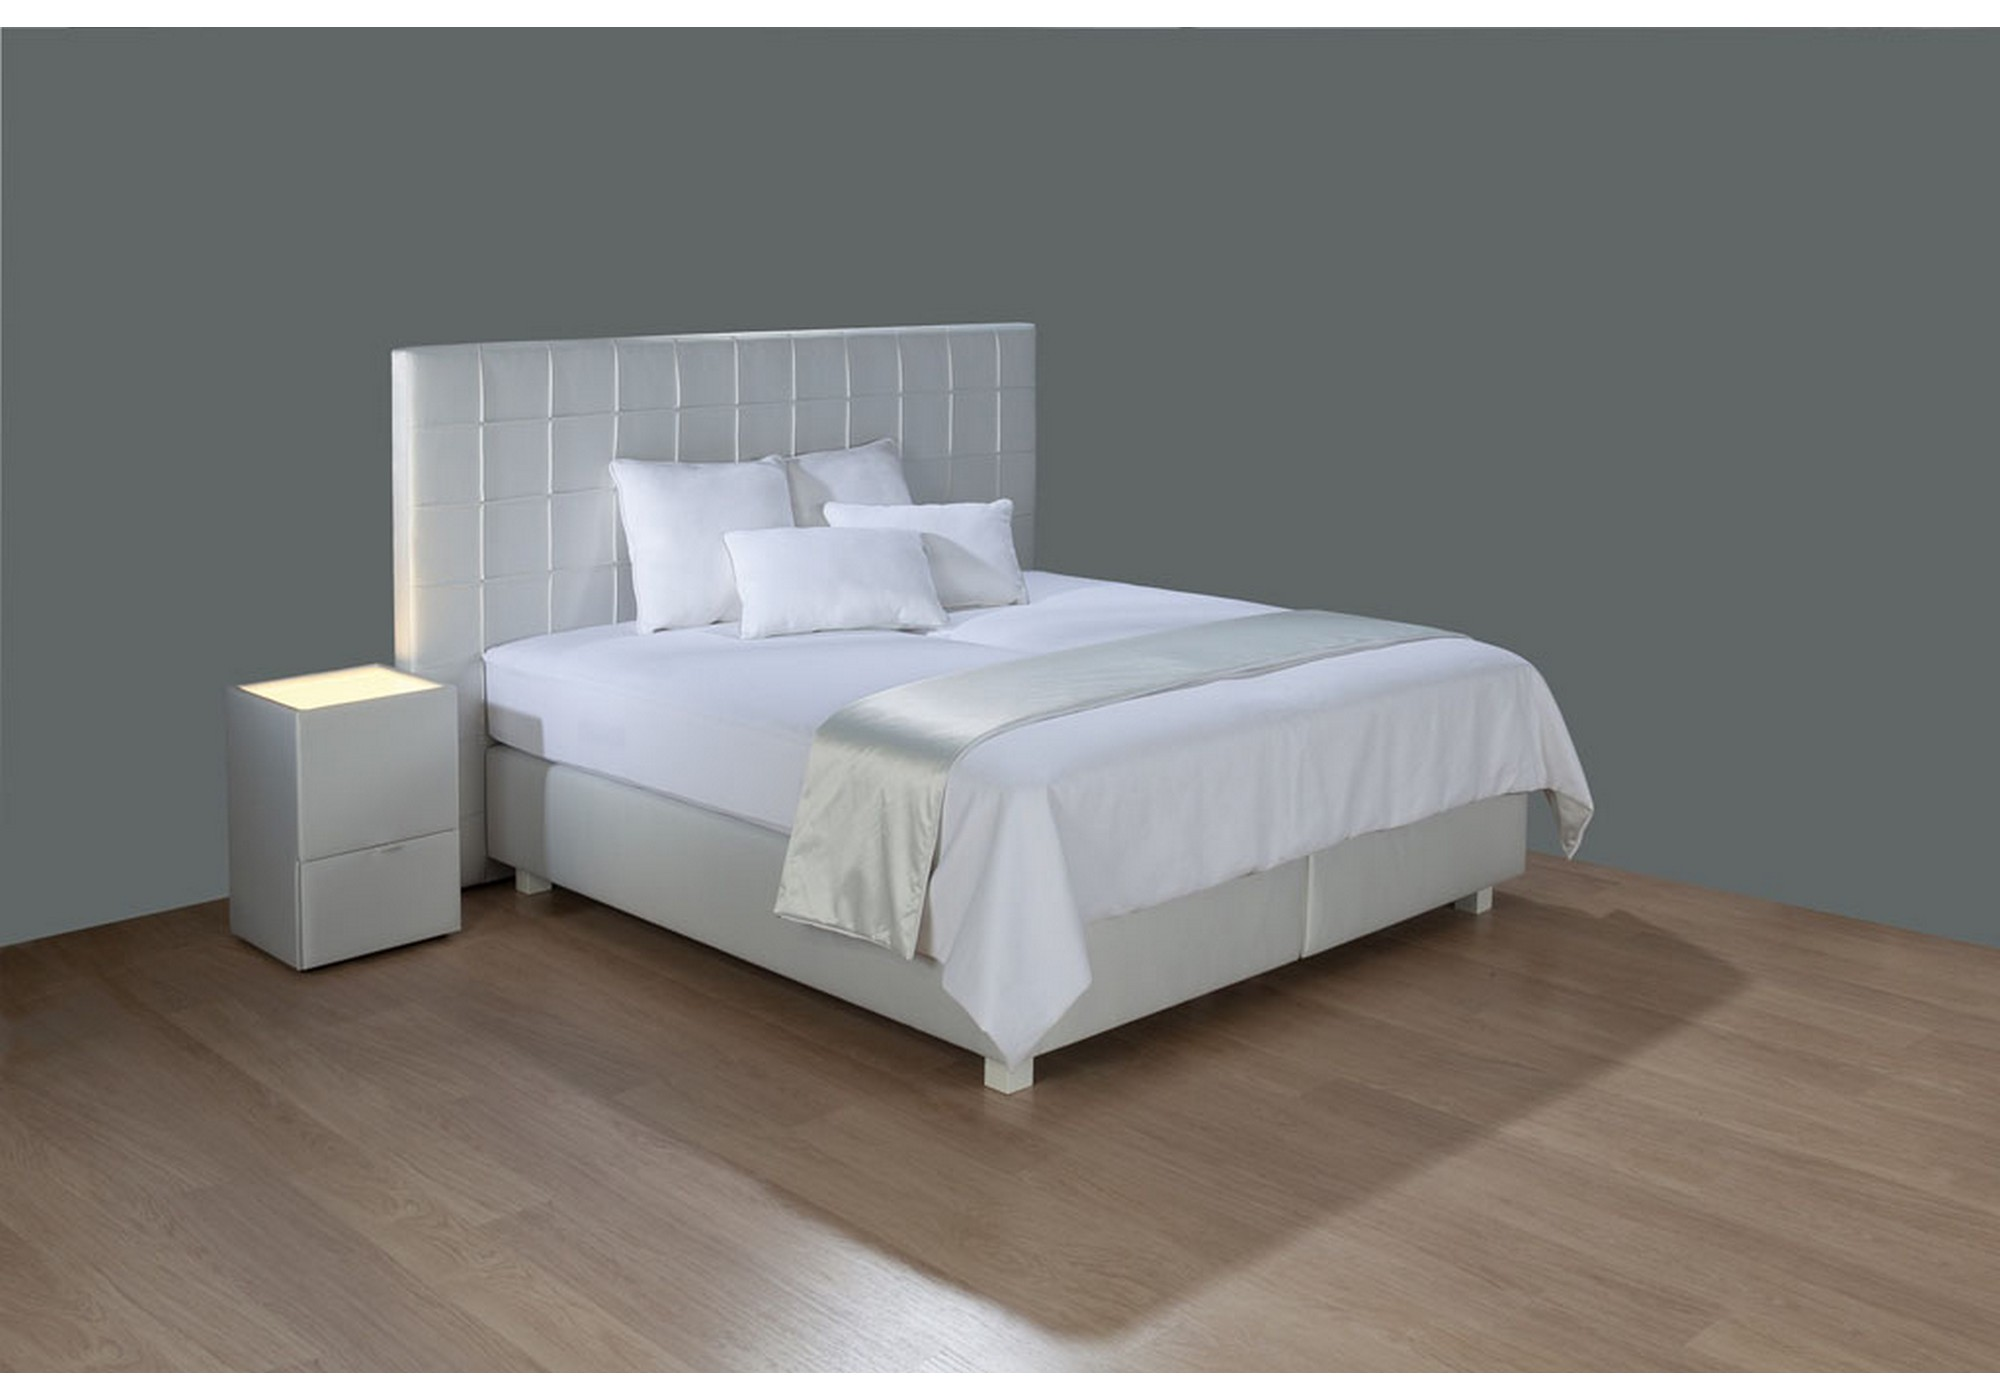 kreamat boxspringbett fortezza betten kraft. Black Bedroom Furniture Sets. Home Design Ideas